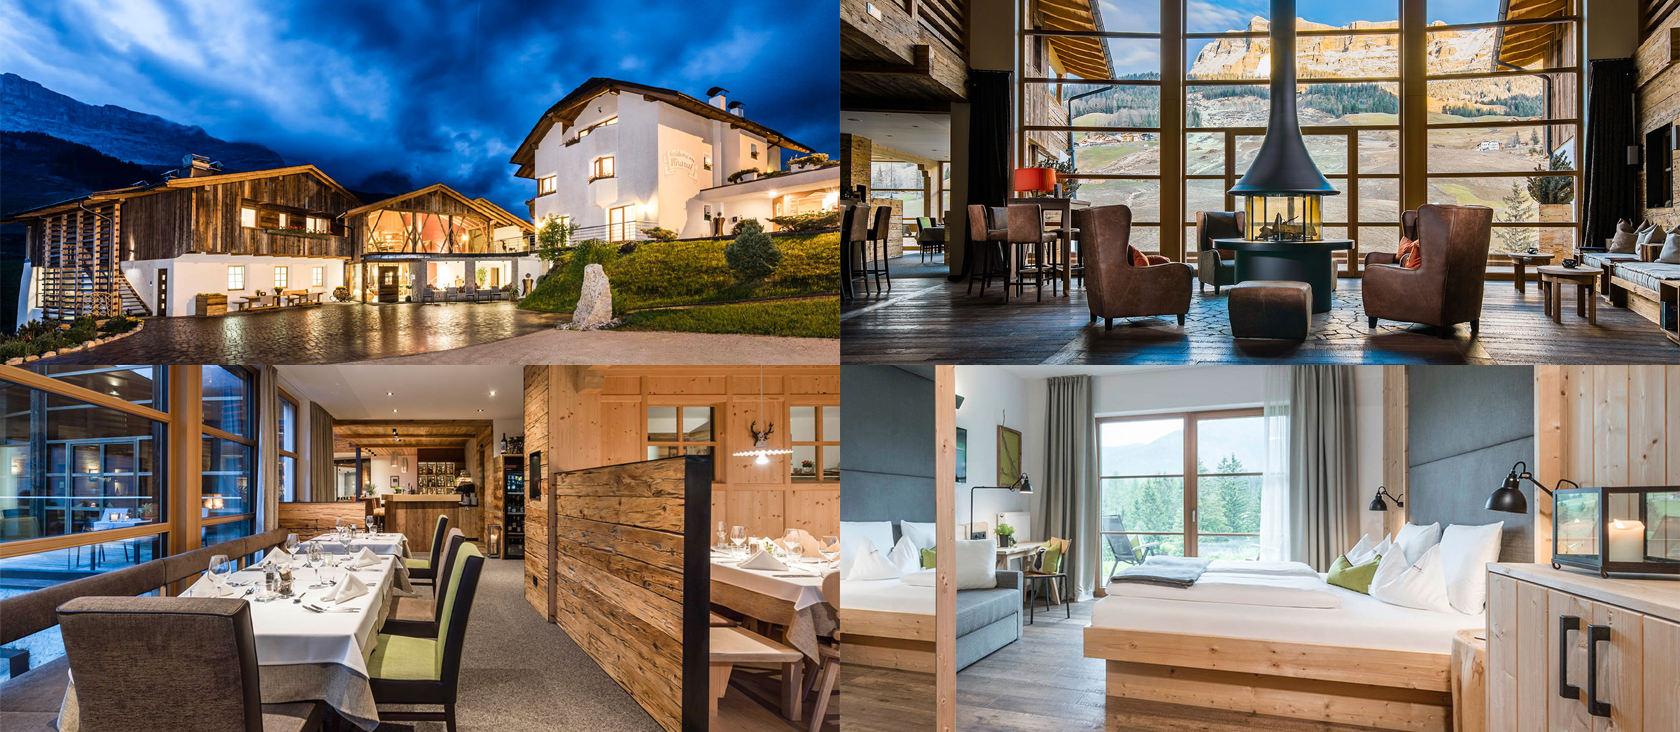 Regio Hotel Südtirol - NaturHotel Miraval